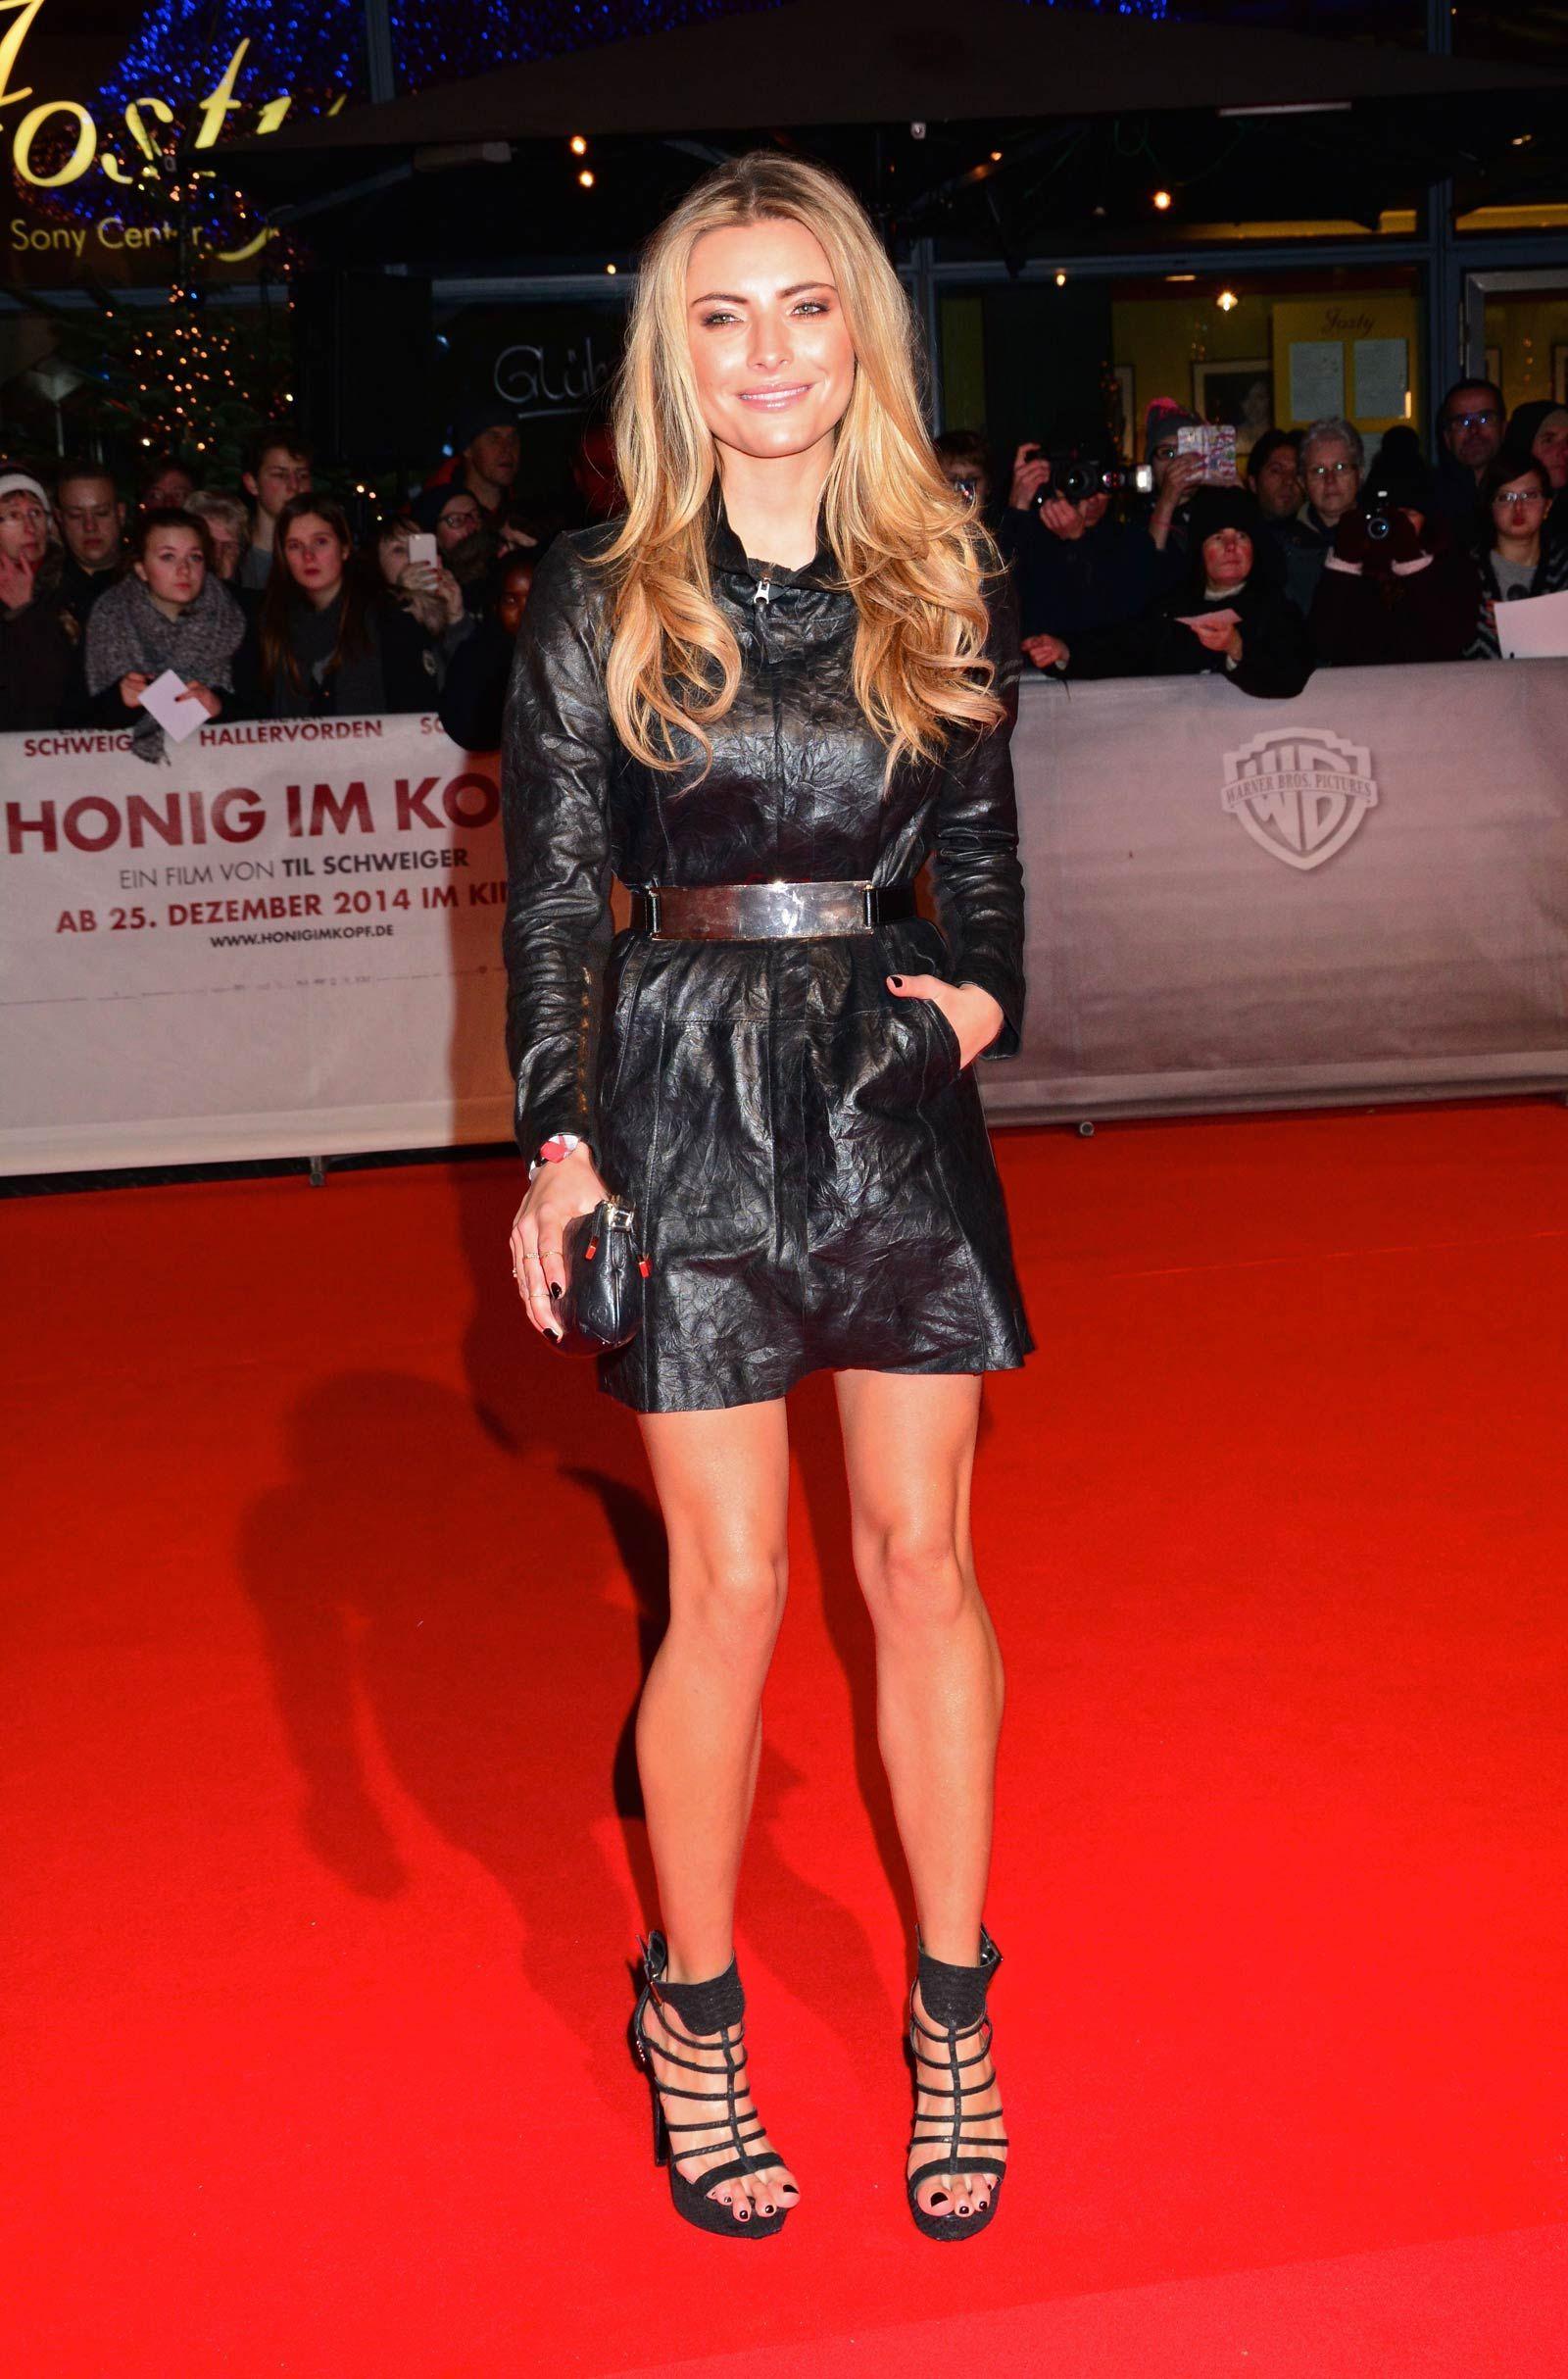 Sophia Thomalla attends Honig im Kopf premiere | Celebs in ...